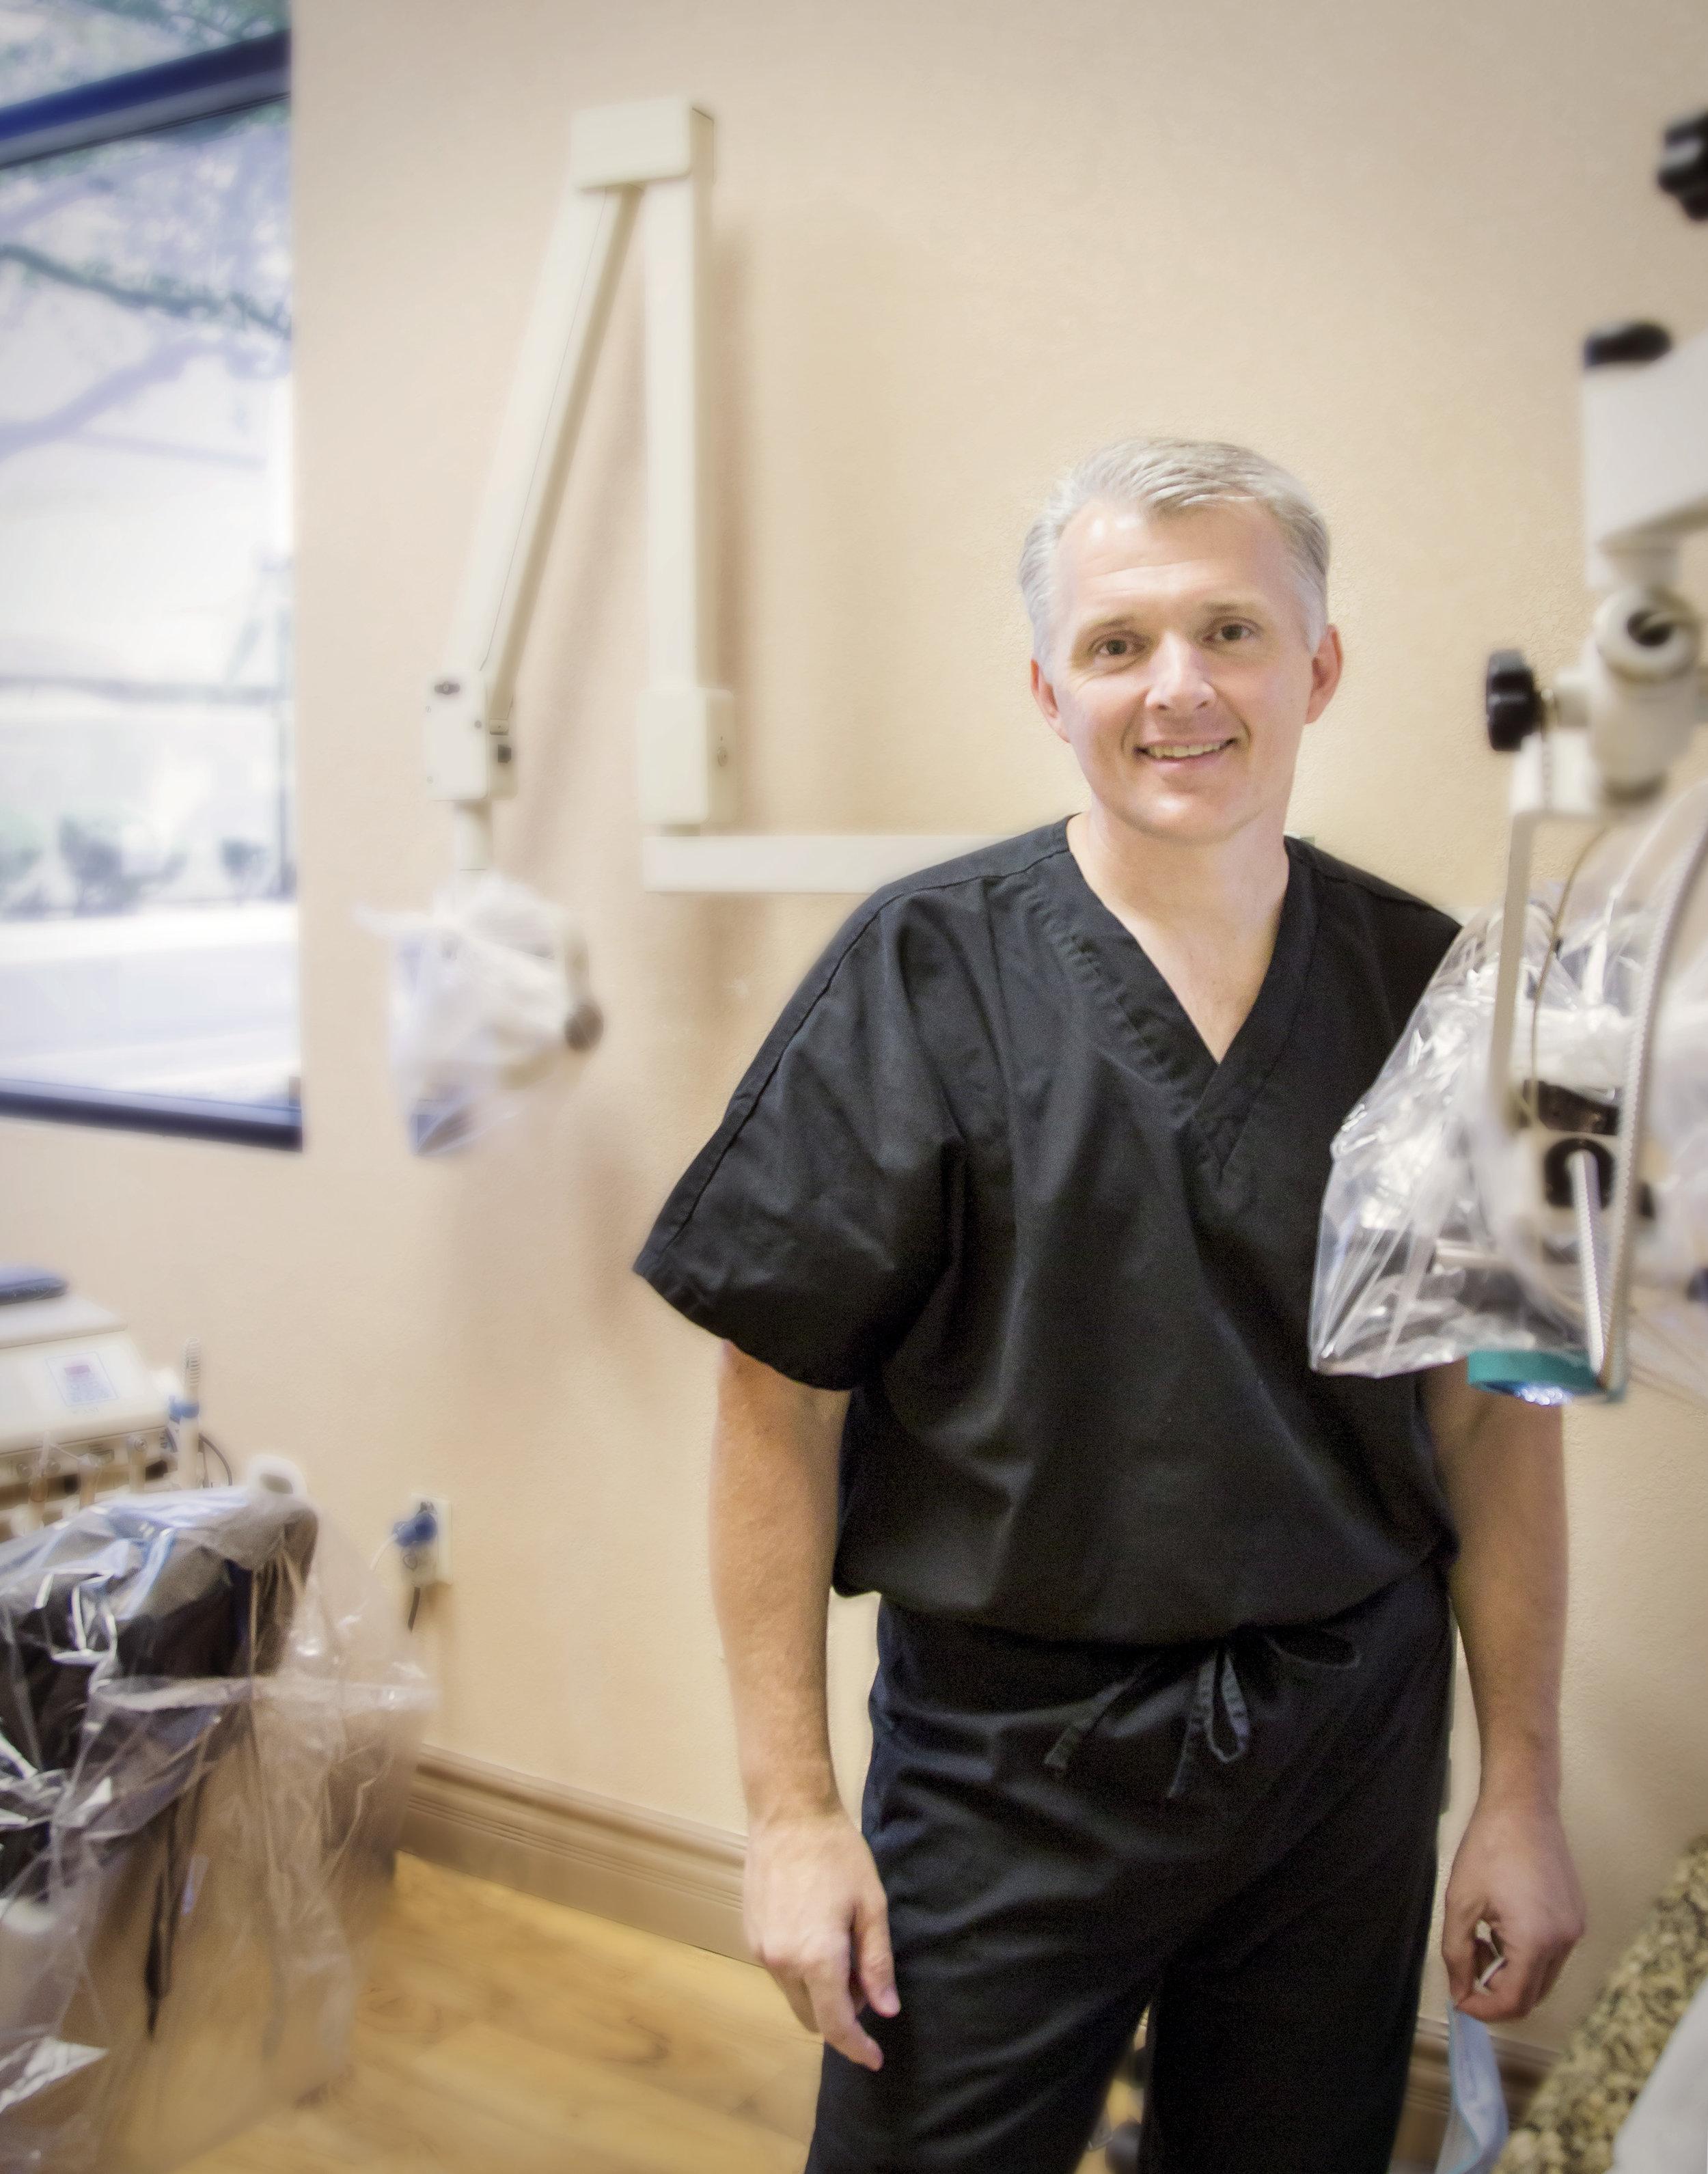 Advanced Endodontics Office-Jessica Bowles-5217.JPG